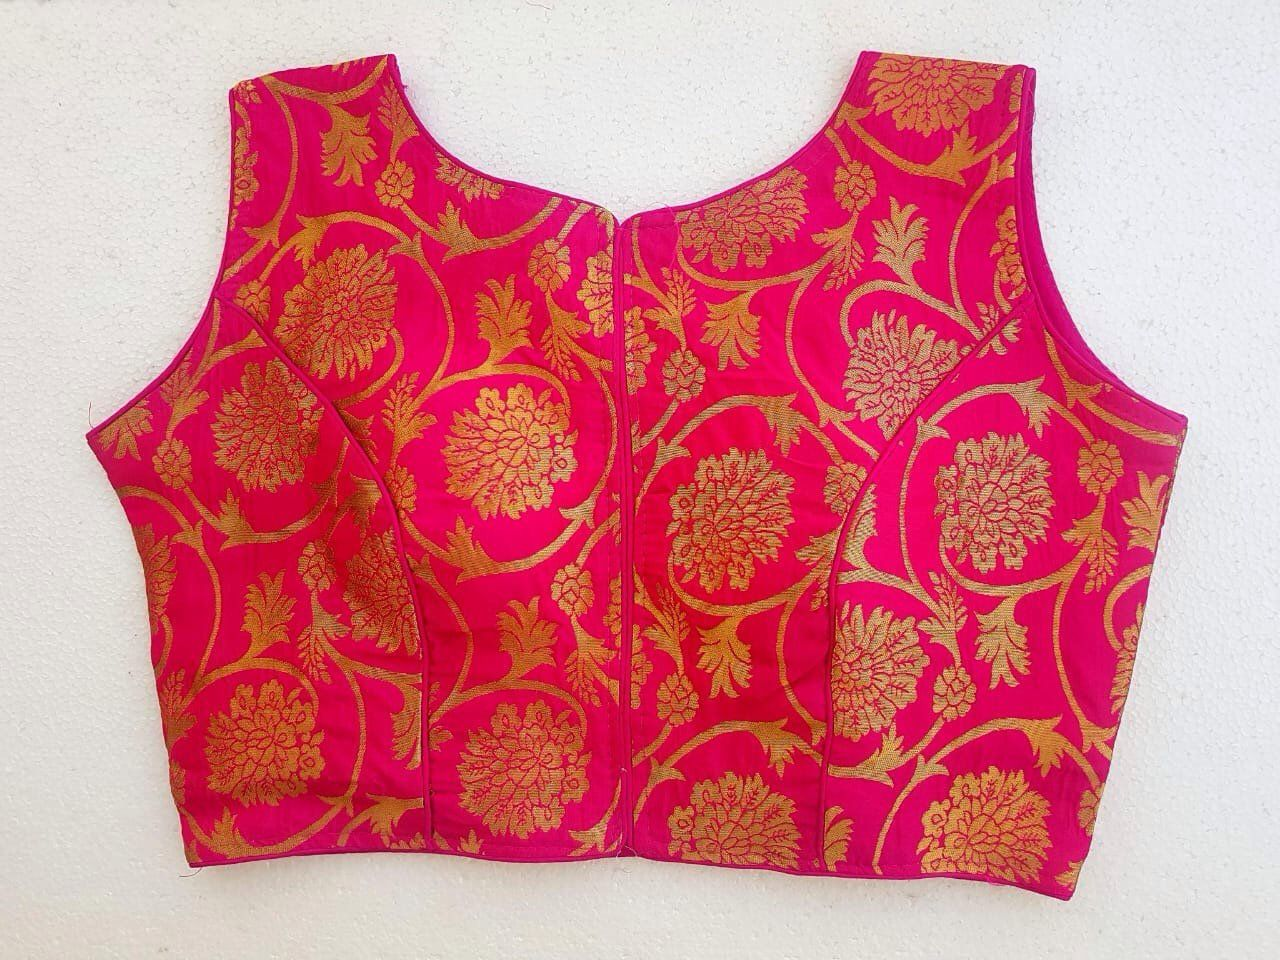 Latest Designer Blouse Ready Made Blouse Red Color Banarasi Silk Blouse Crop Top Choli Sari Beautiful Weaved Wedding /& Party Wear For Women